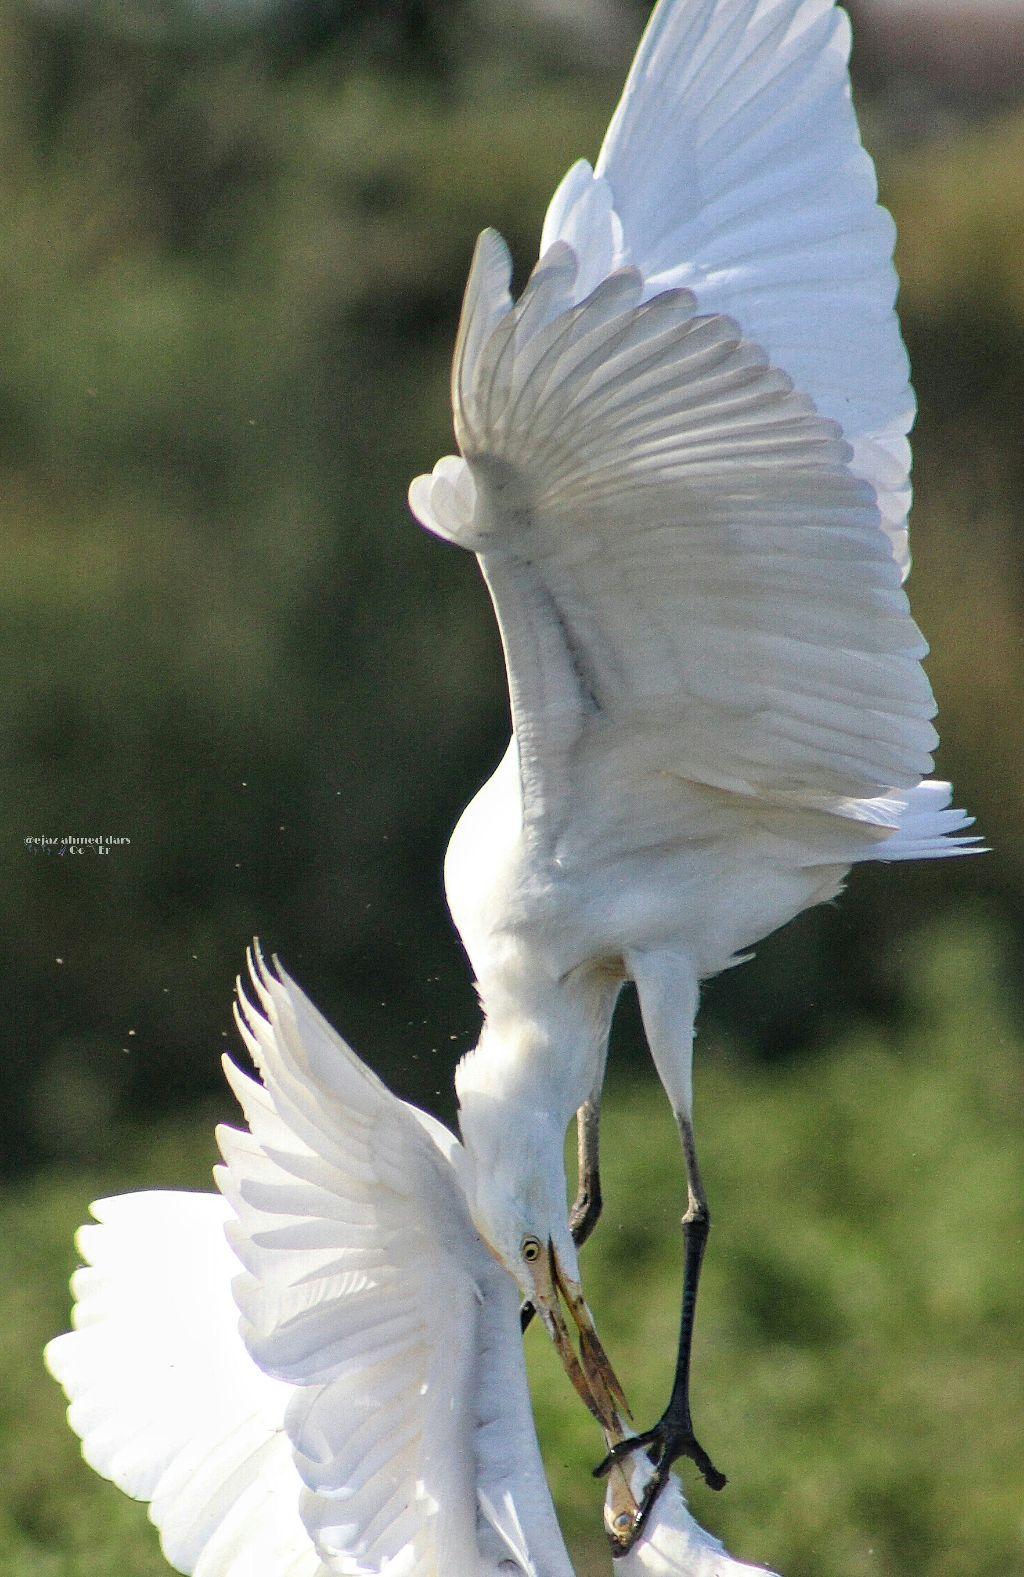 #nature #photography #love #music #freetoedit